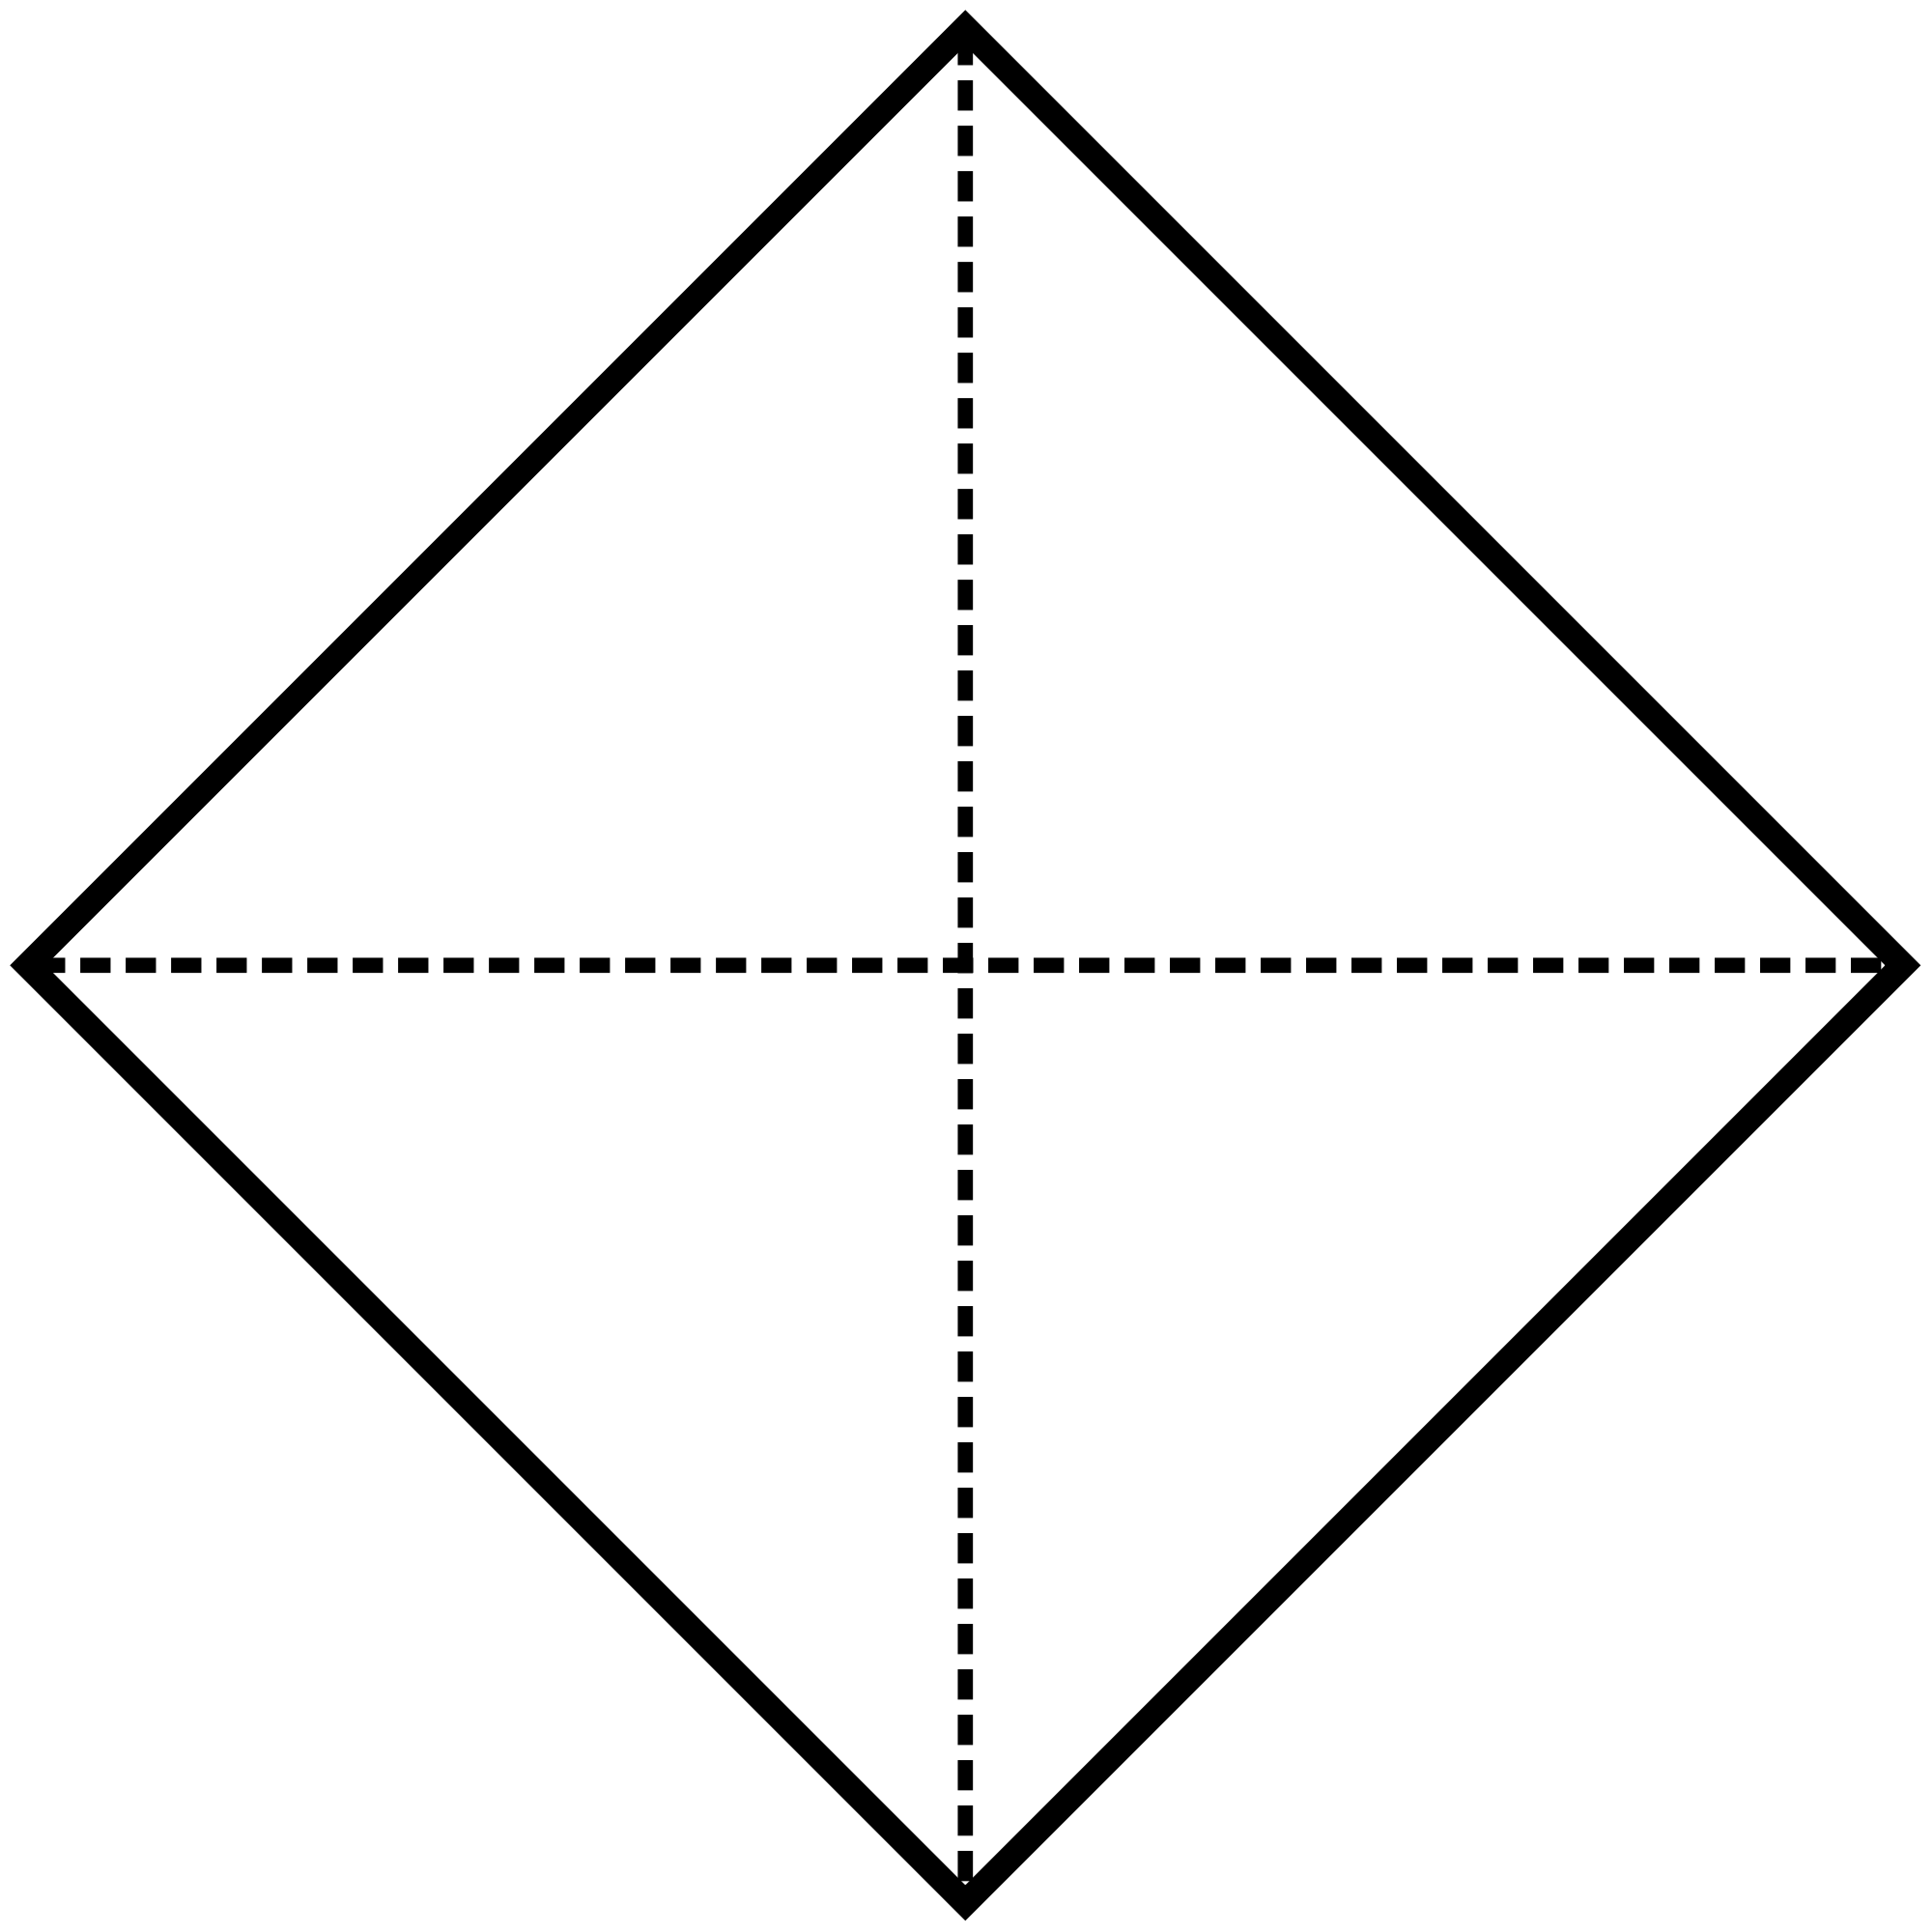 Clipart diamond svg. File square shape wikimedia